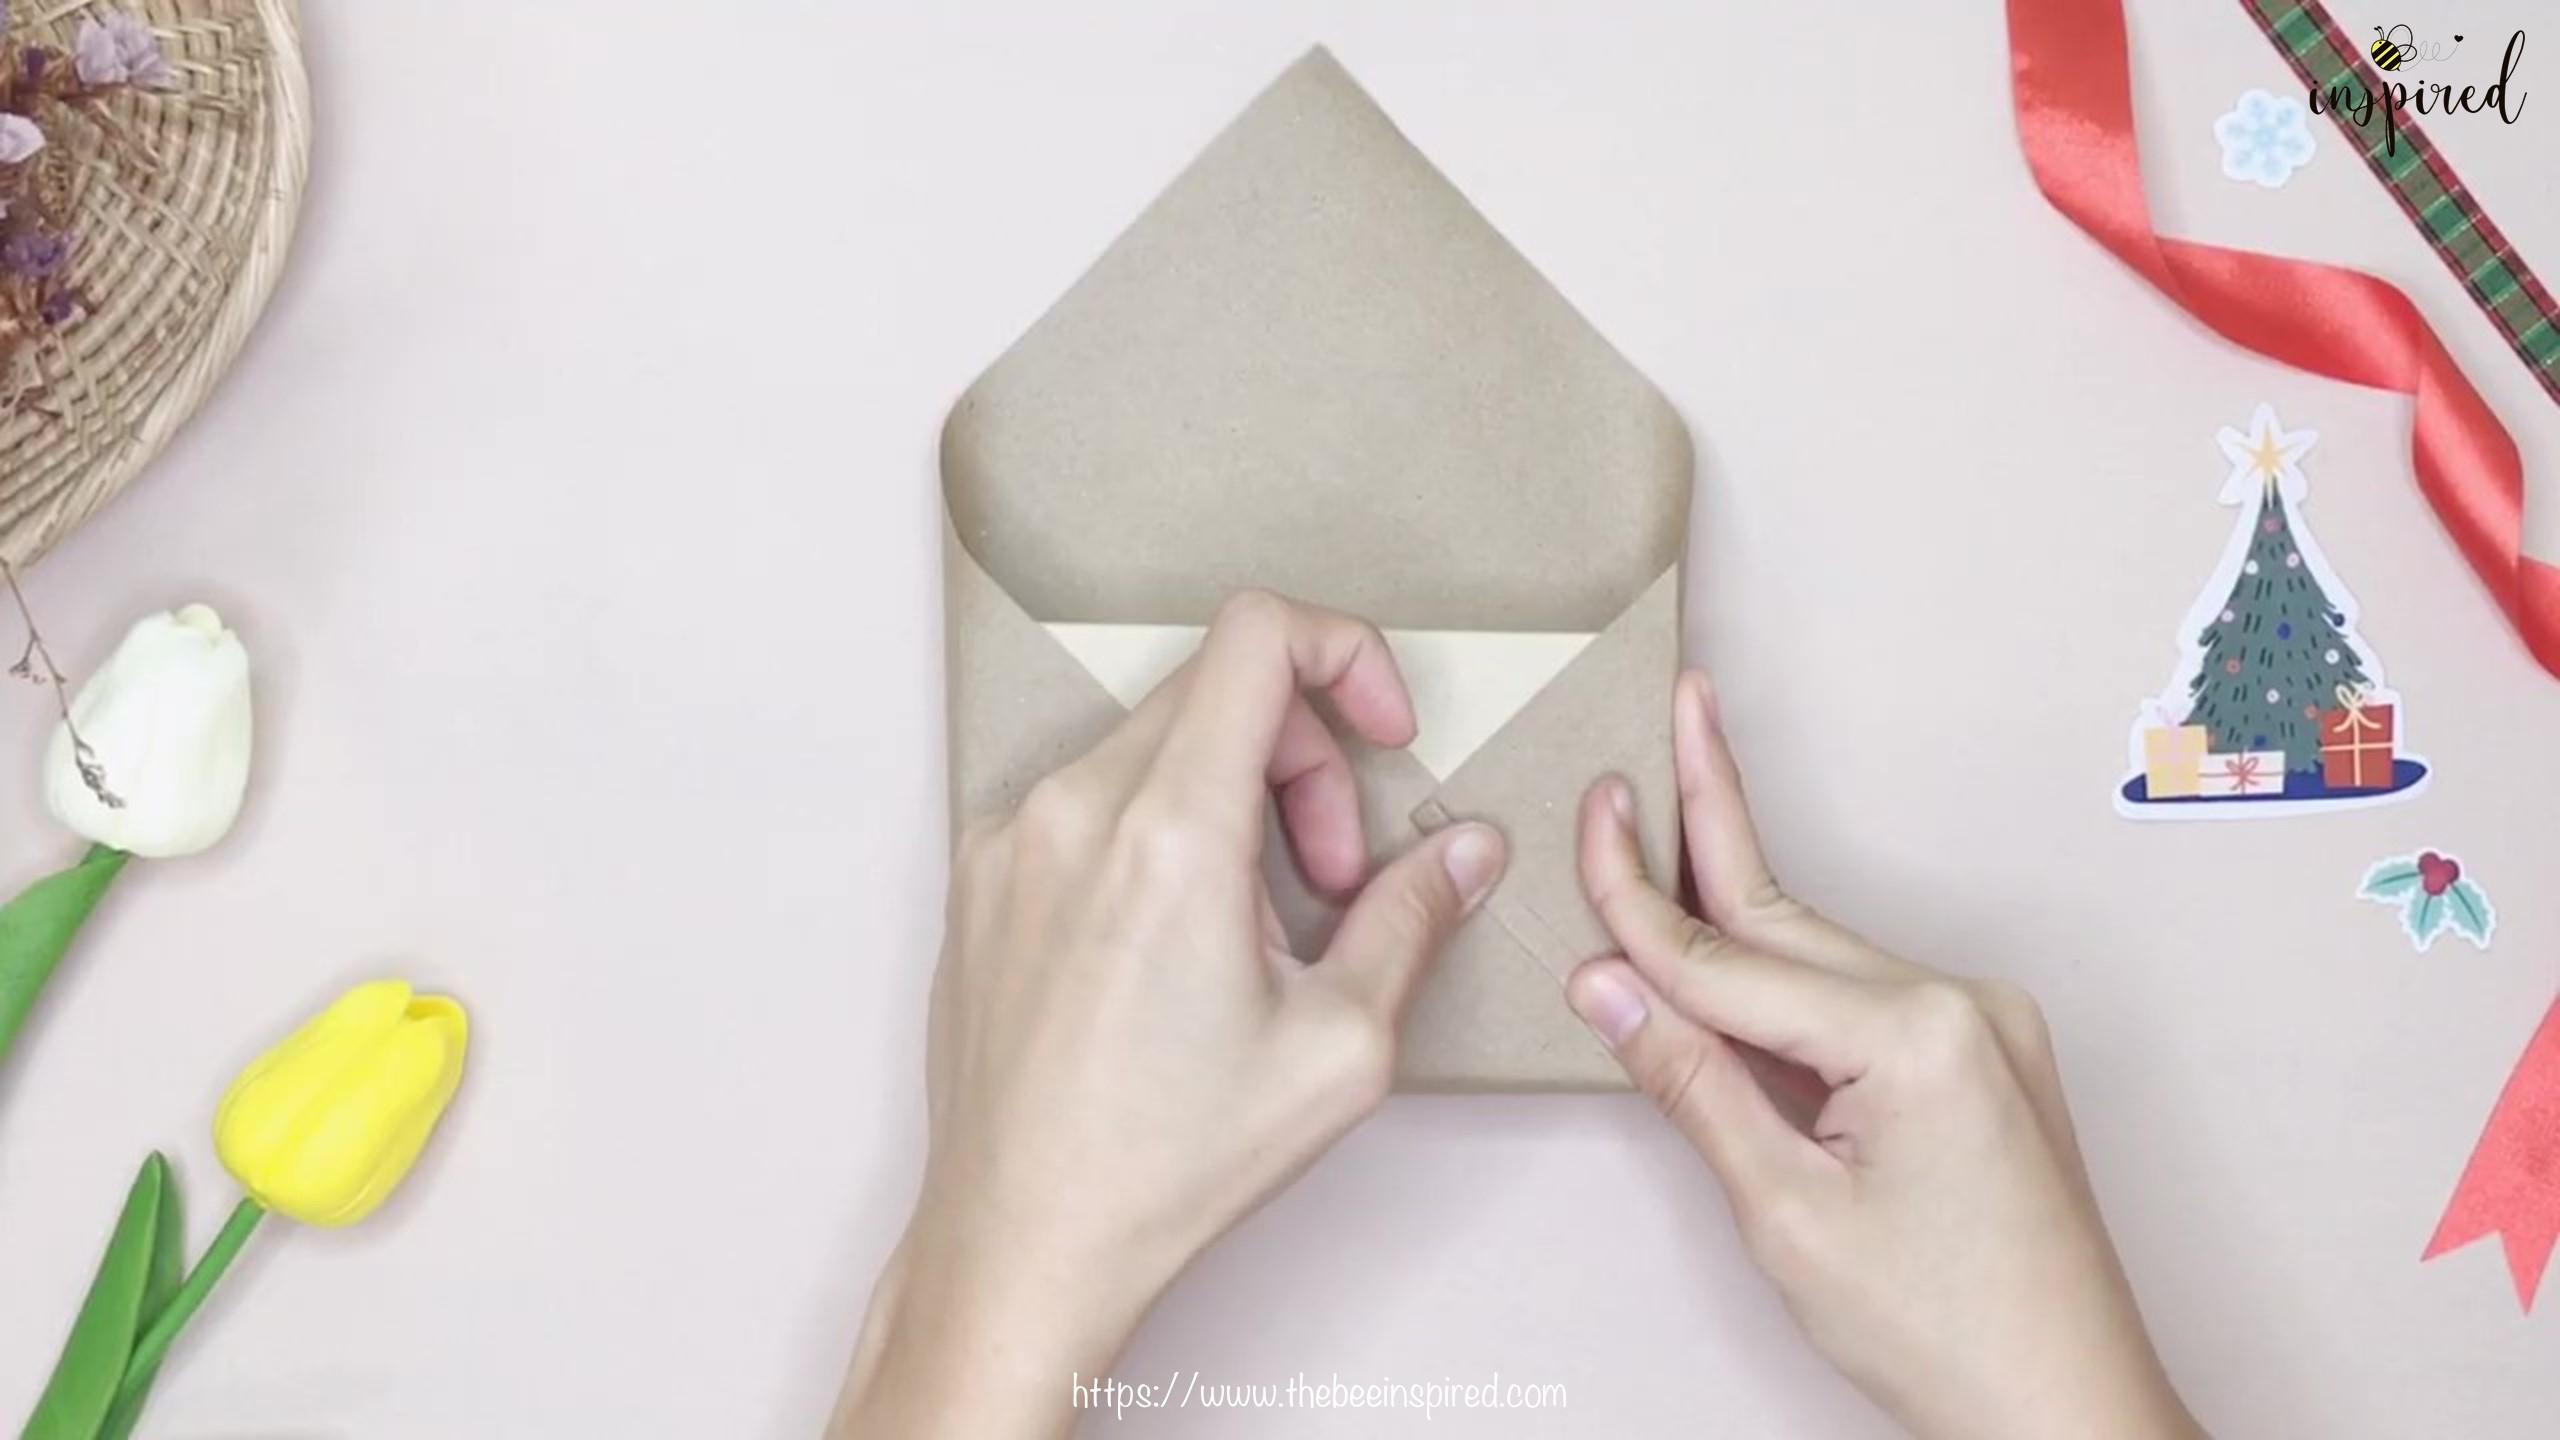 DIY วิธีห่อของขวัญวันวาเลนไทน์ วันปีใหม่ วันคริสมาส & วันเกิด แบบประหยัดกระดาษ_ Gift Wrapping Hack_7